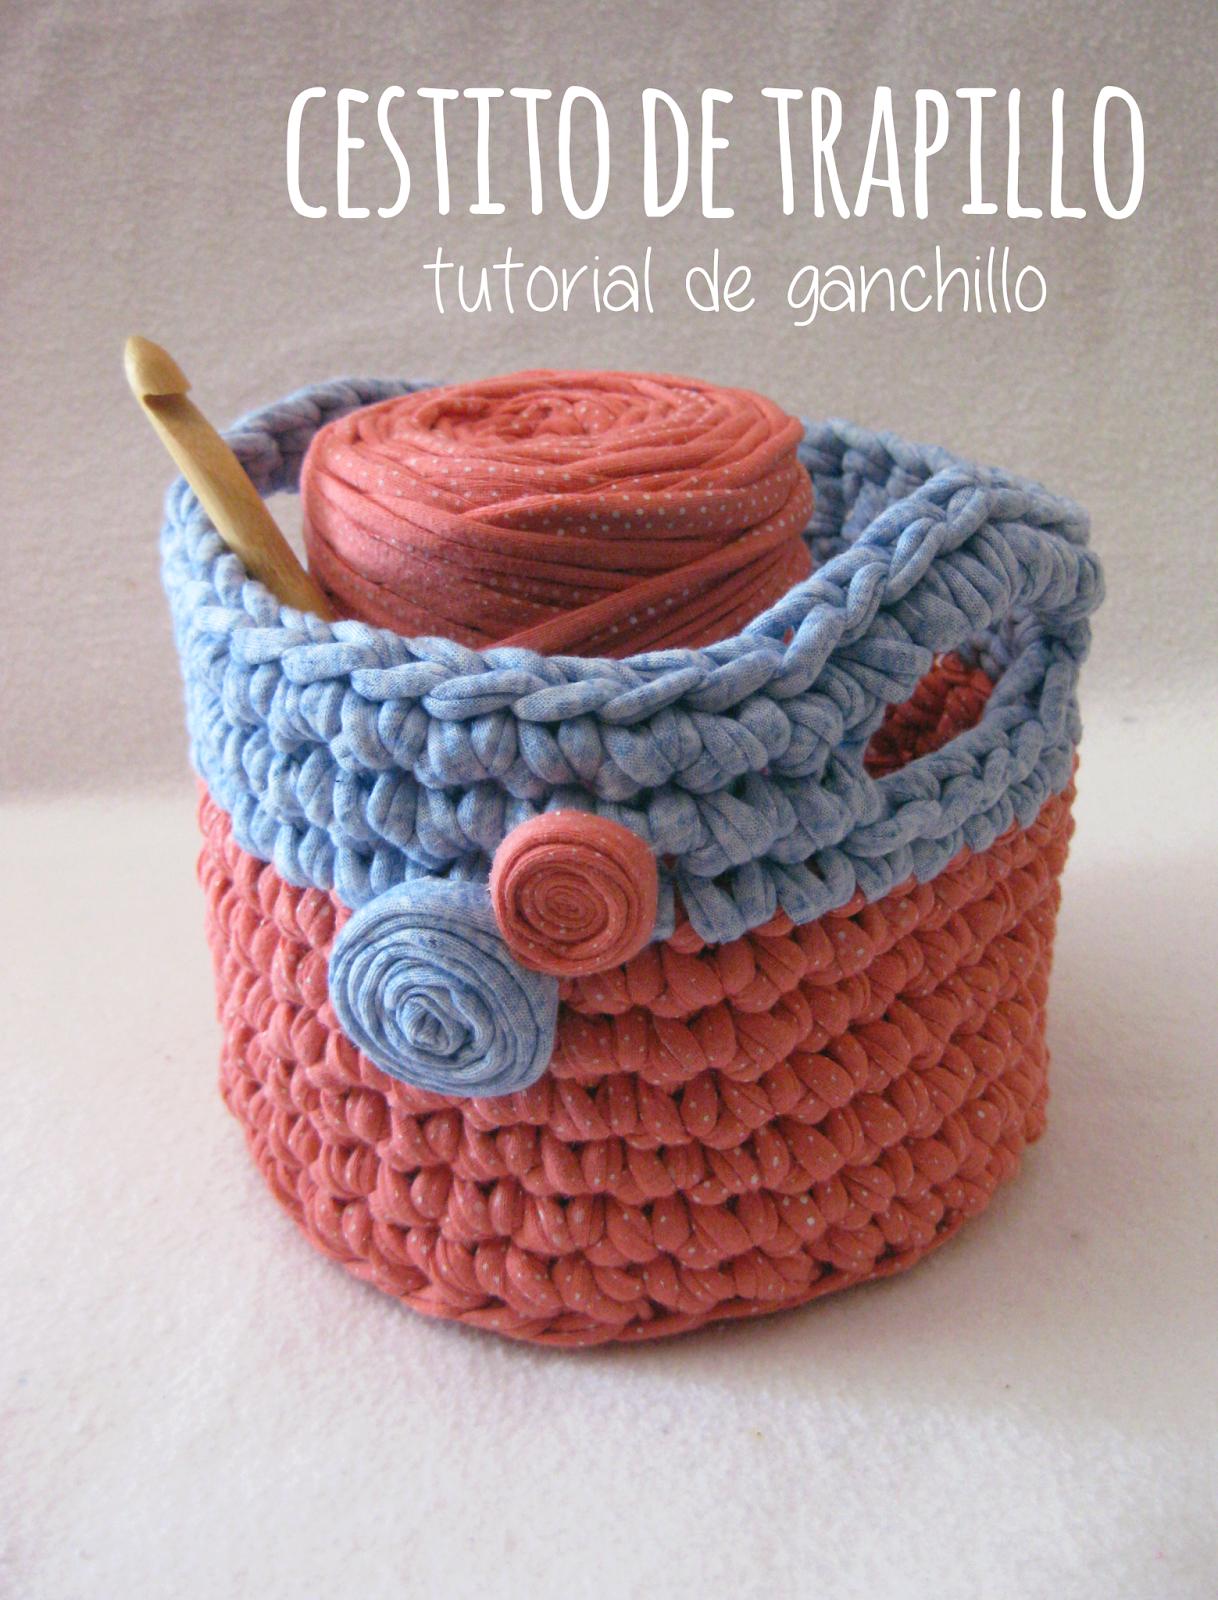 Proyecto handmade c mo hacer una cesta peque a o cestito - Cosas de trapillo ...